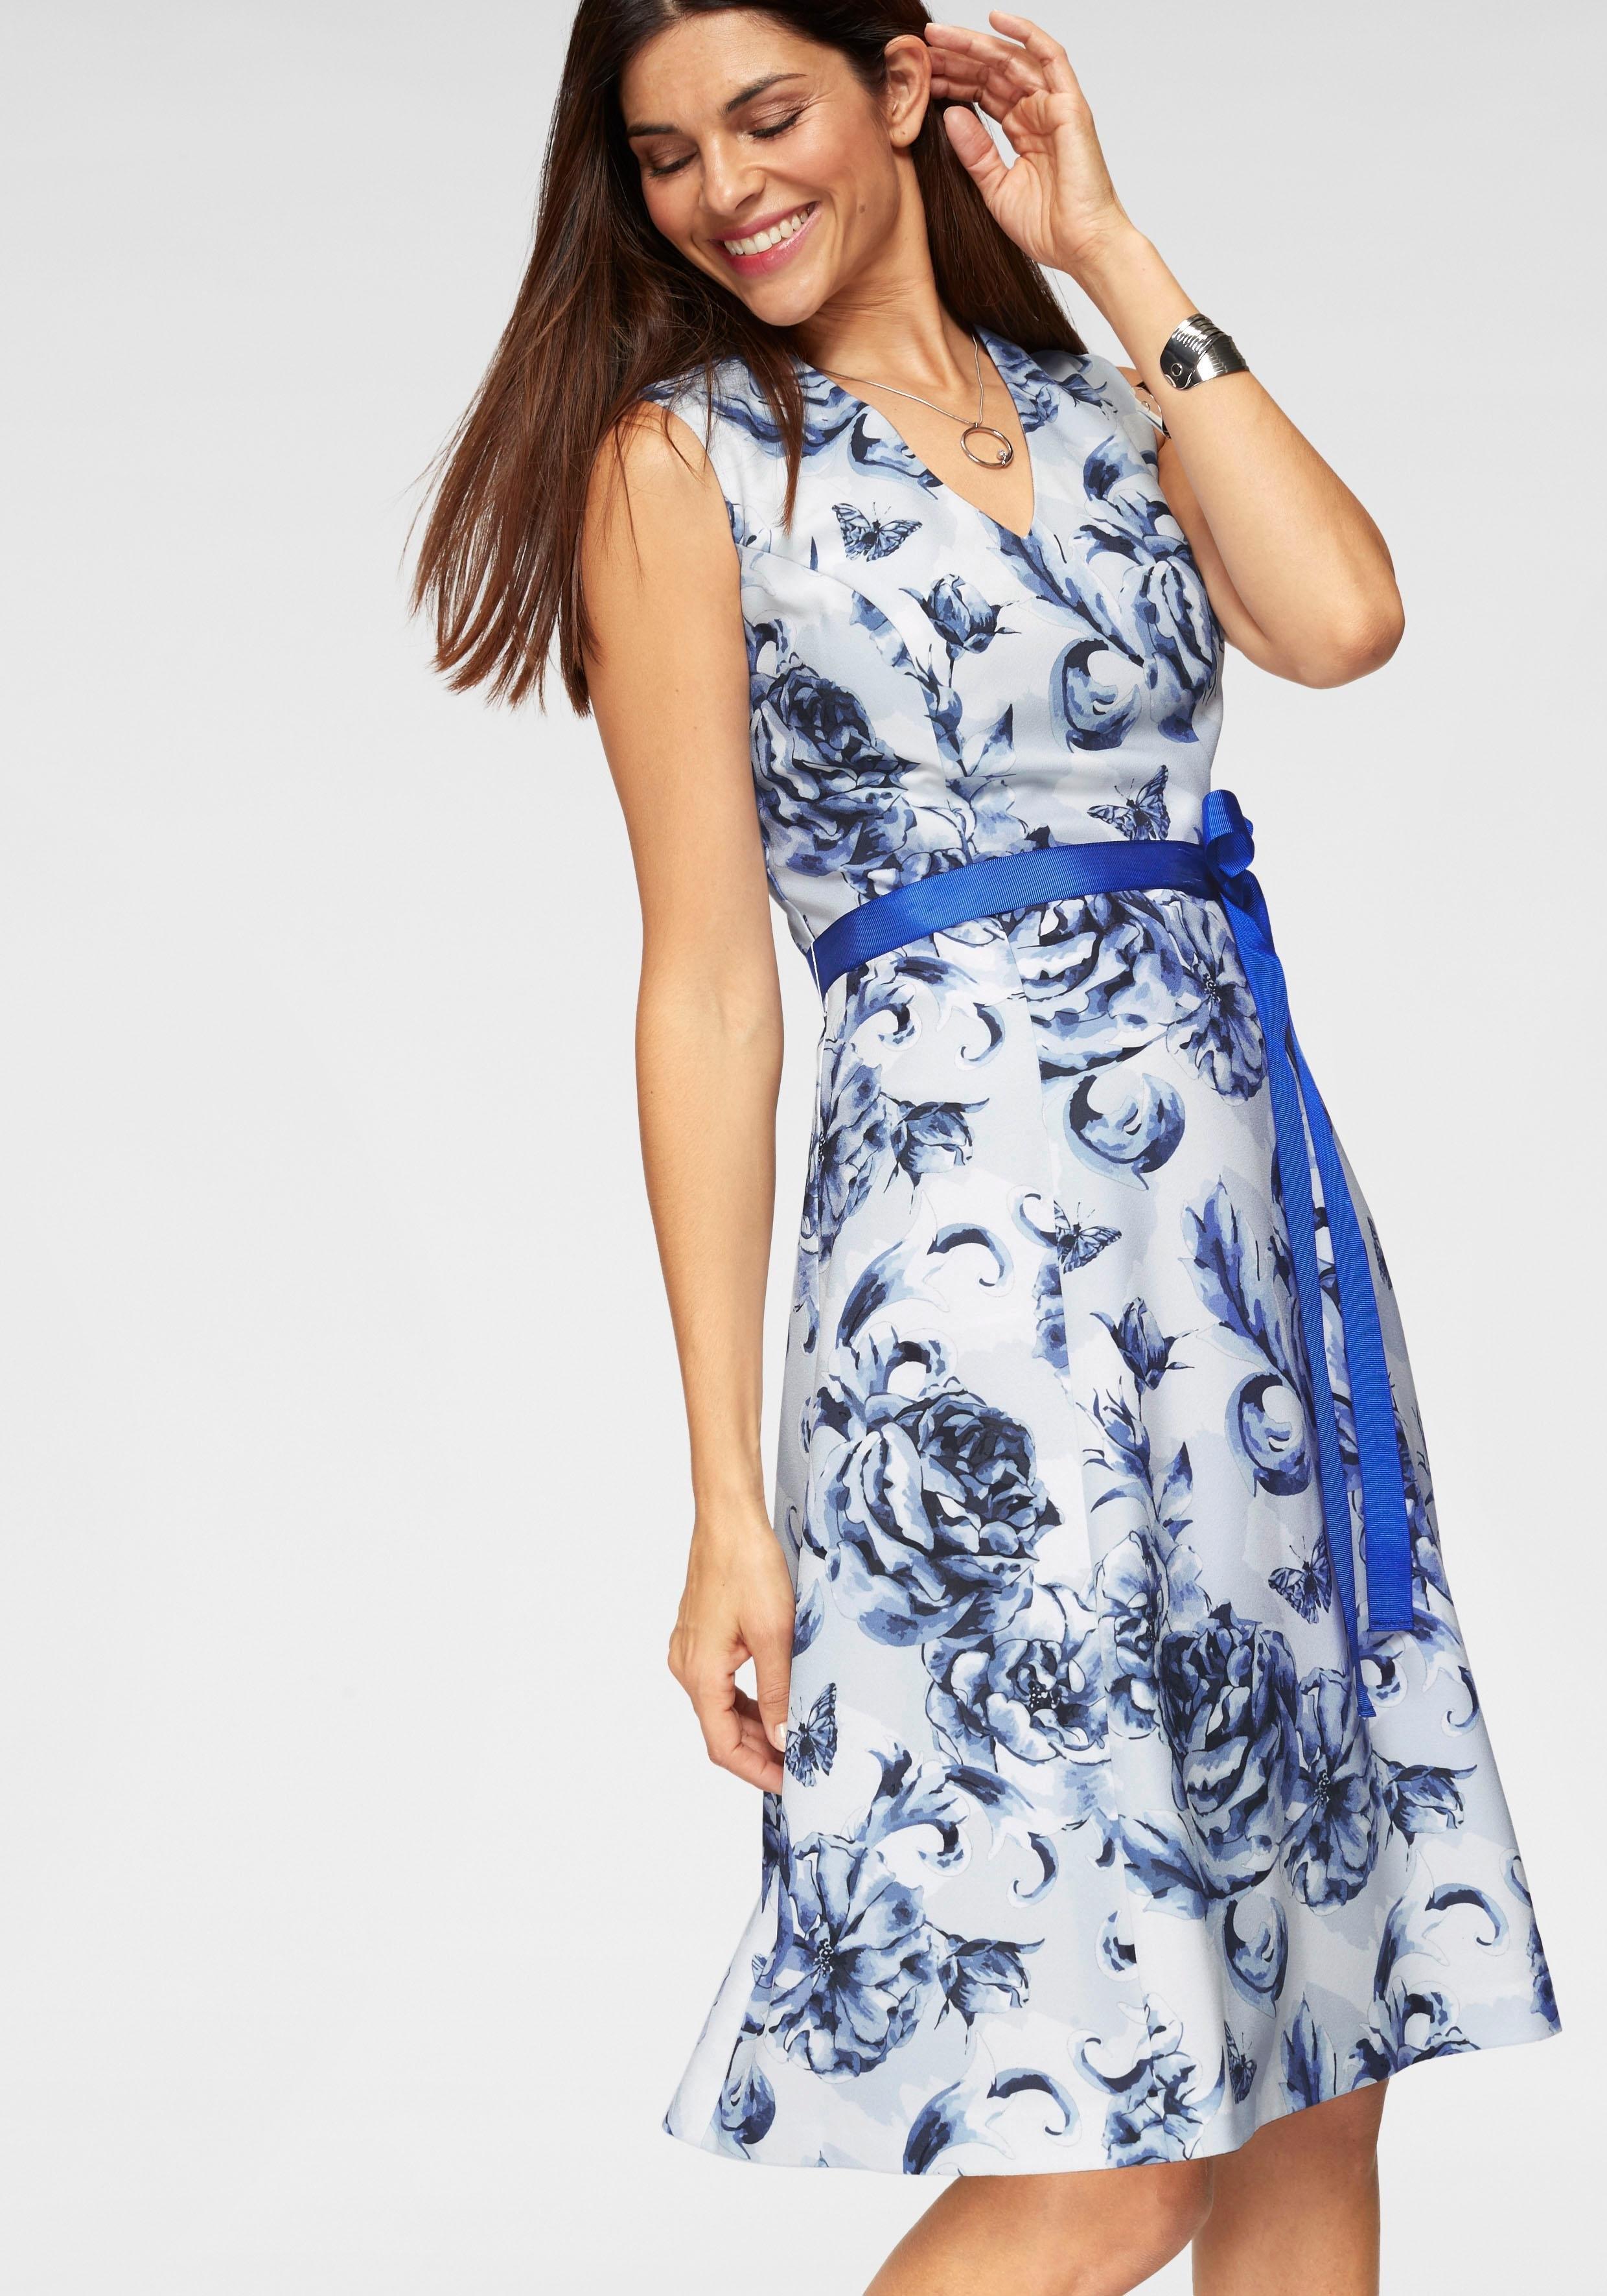 Bodyright gedessineerde jurk »Shaping« bij OTTO online kopen